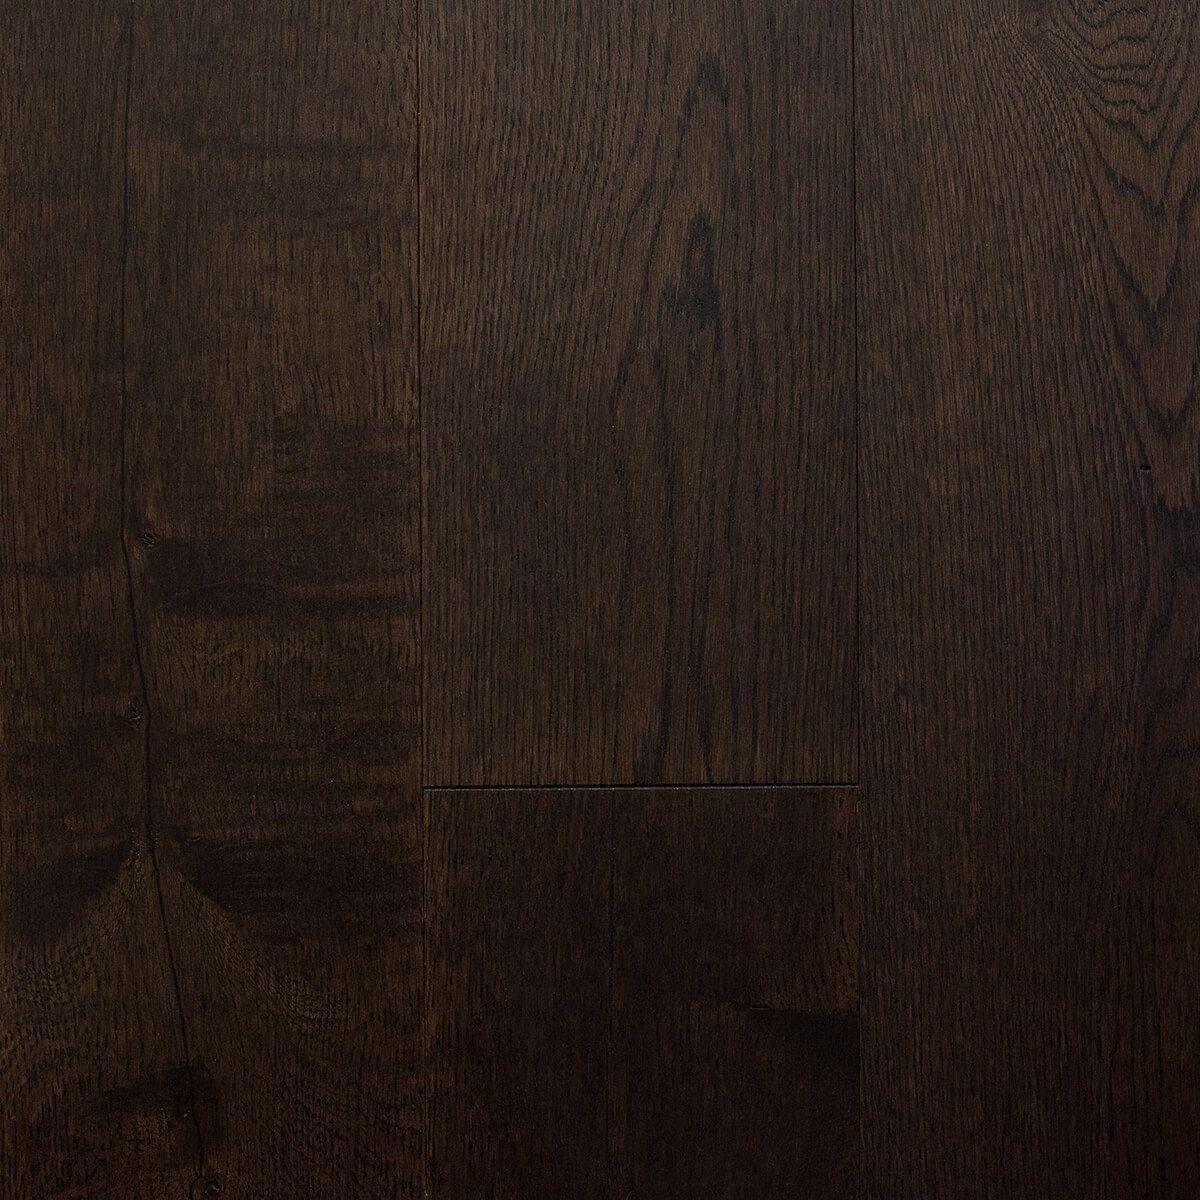 Wexford Engineered Espresso Hardwood floors, Flooring